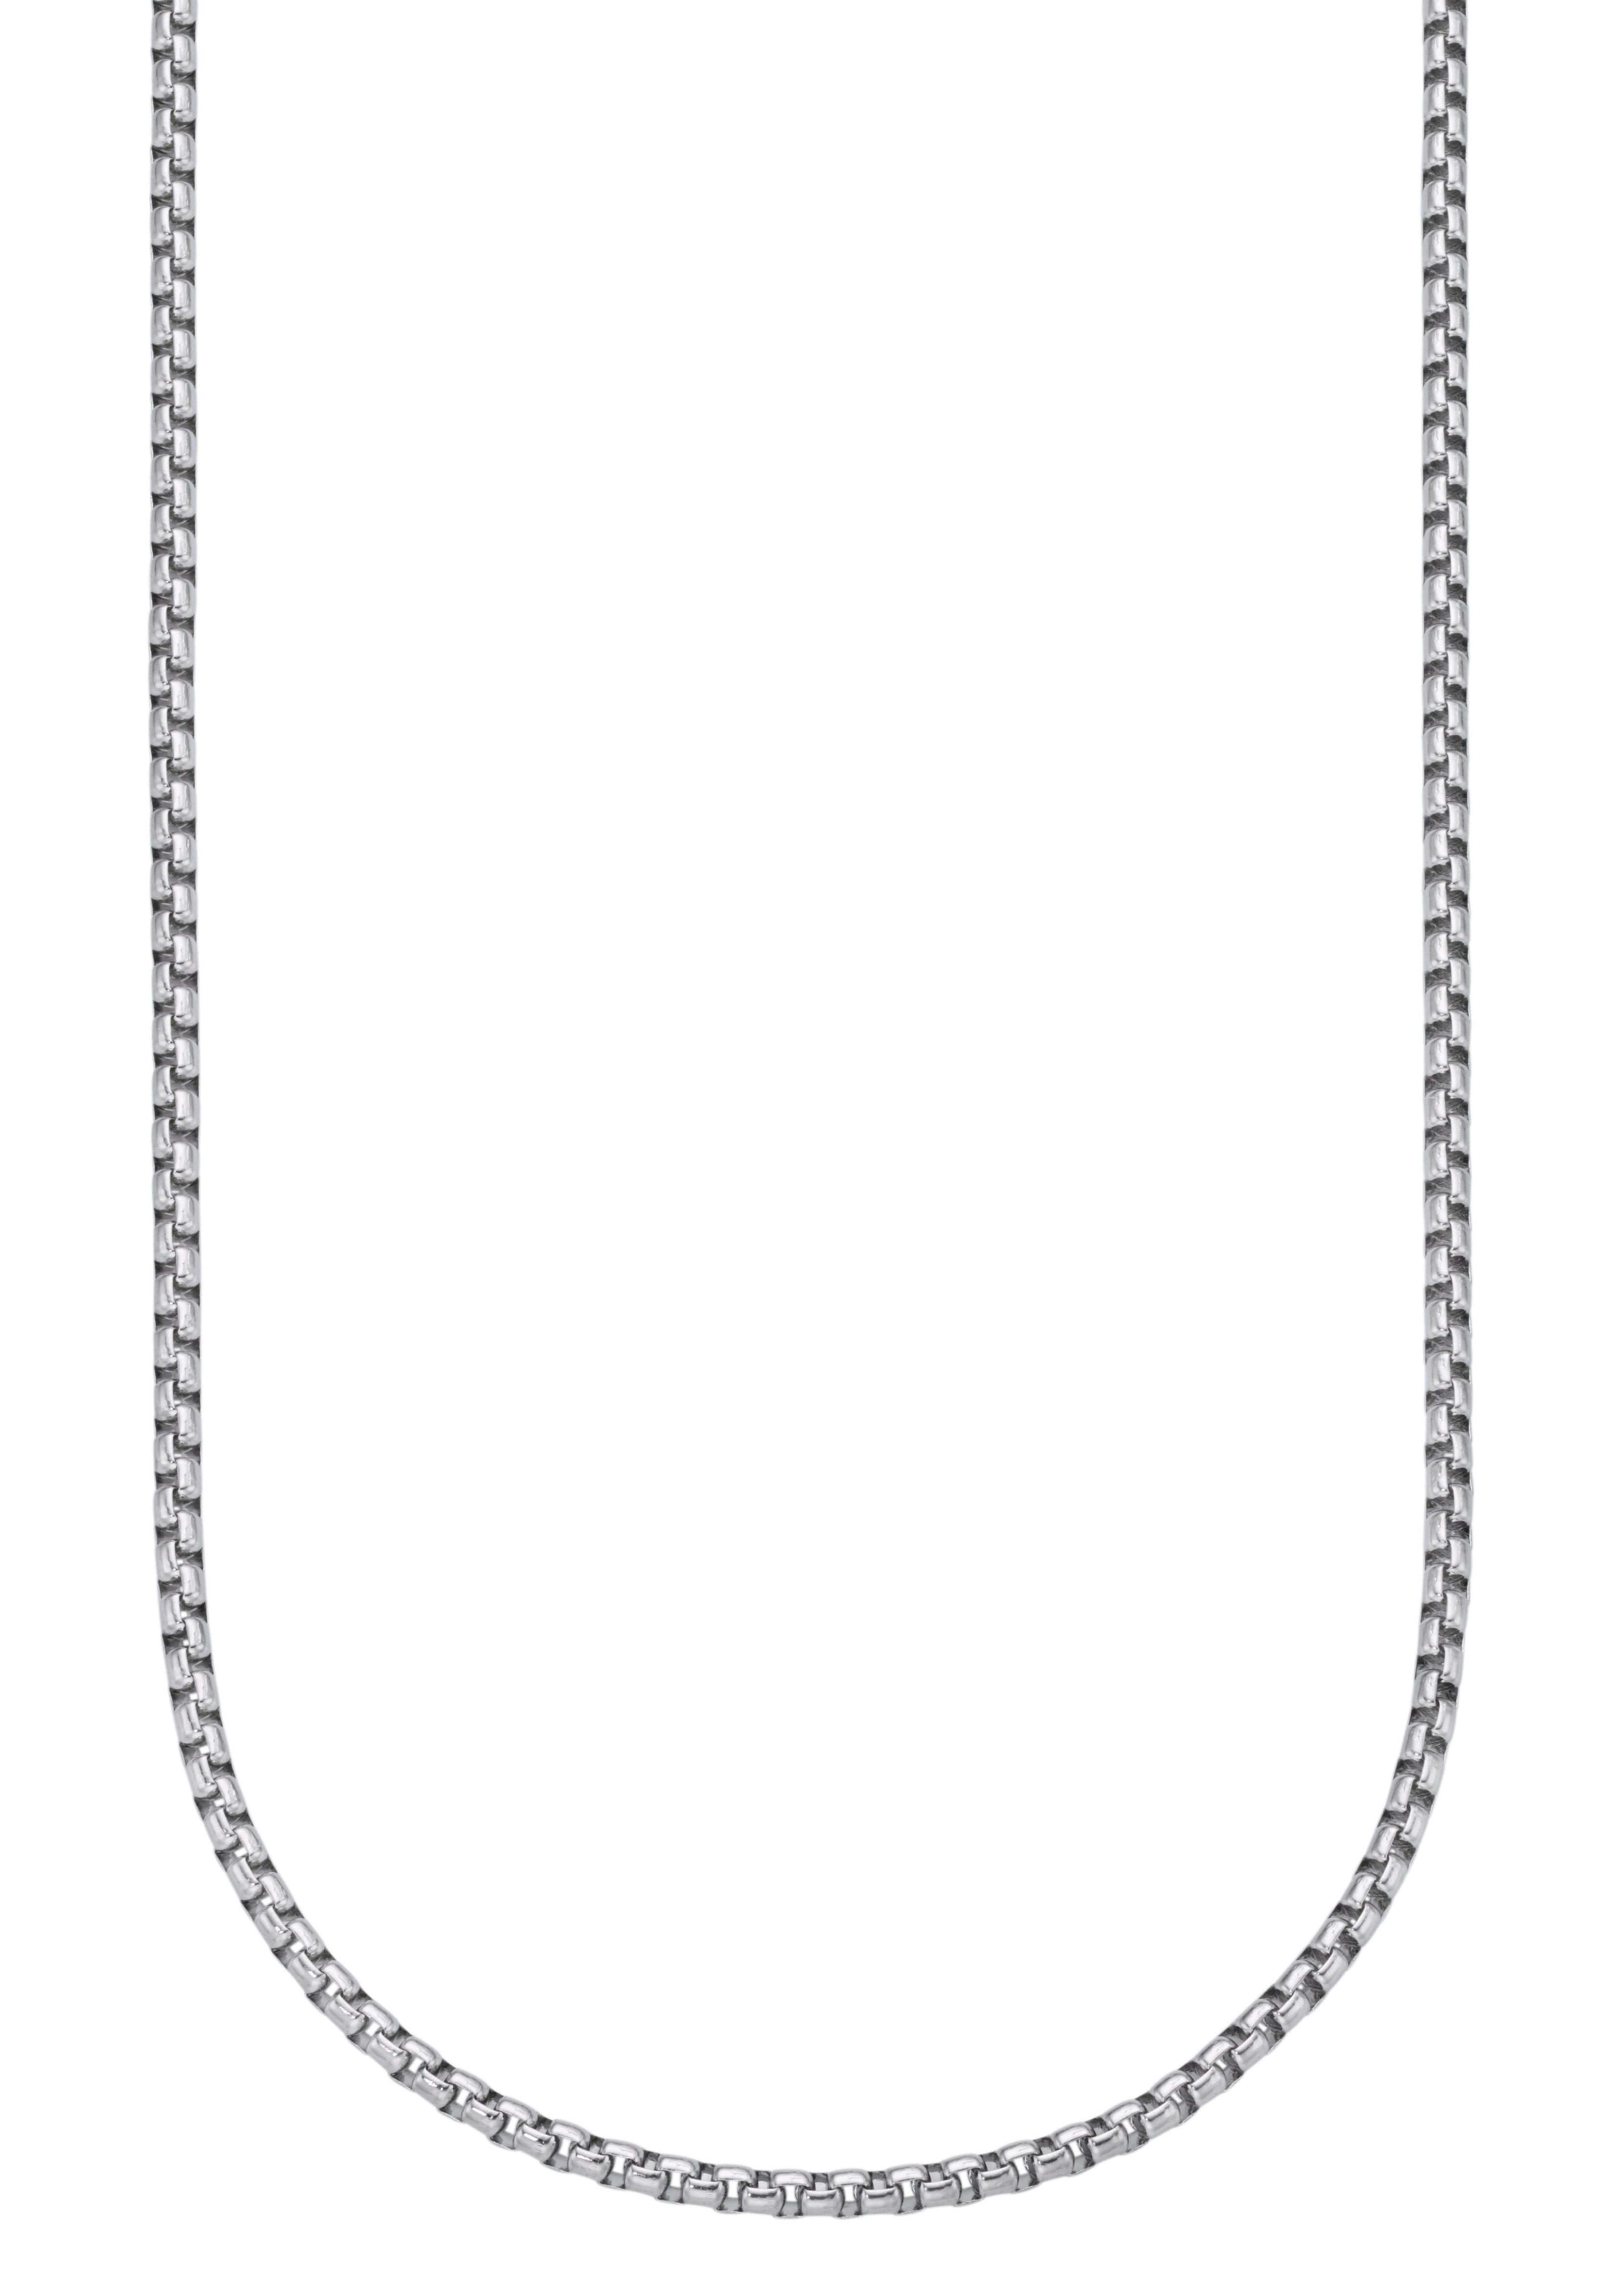 Firetti Edelstahlkette Venezianerkettengliederung 20 mm breit Klassiker | Schmuck > Halsketten > Edelstahlketten | Firetti